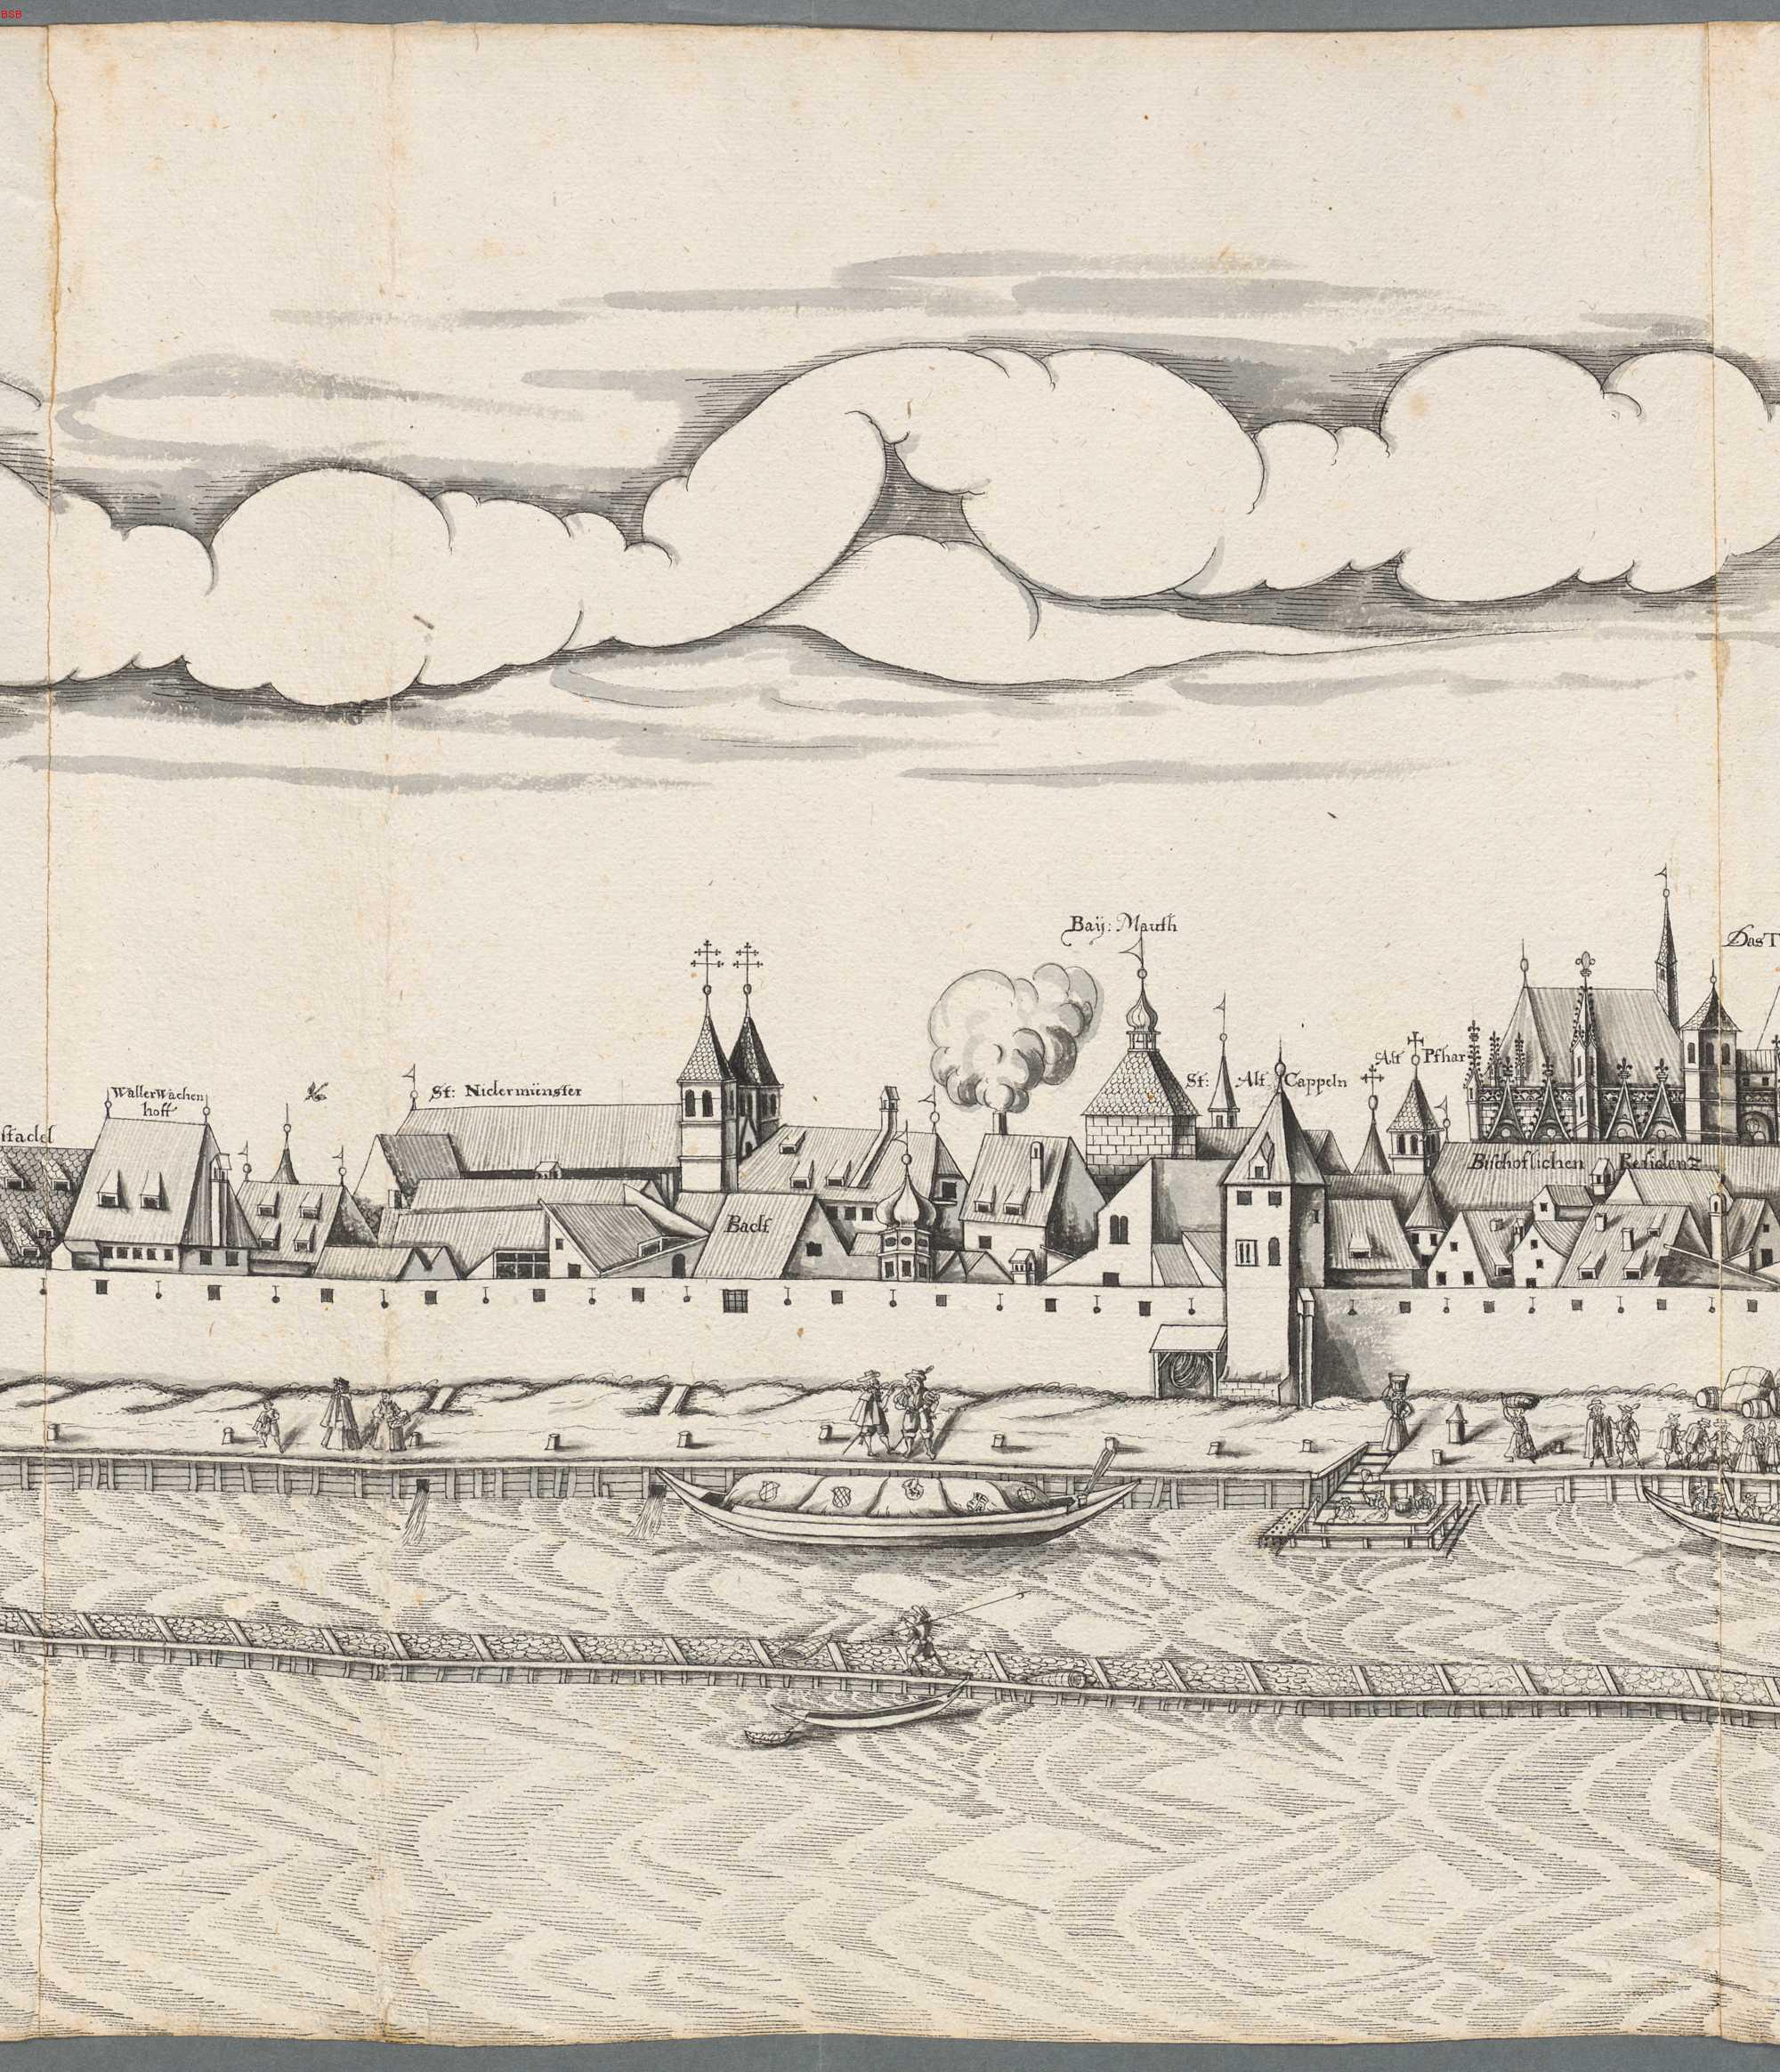 waller regensburg